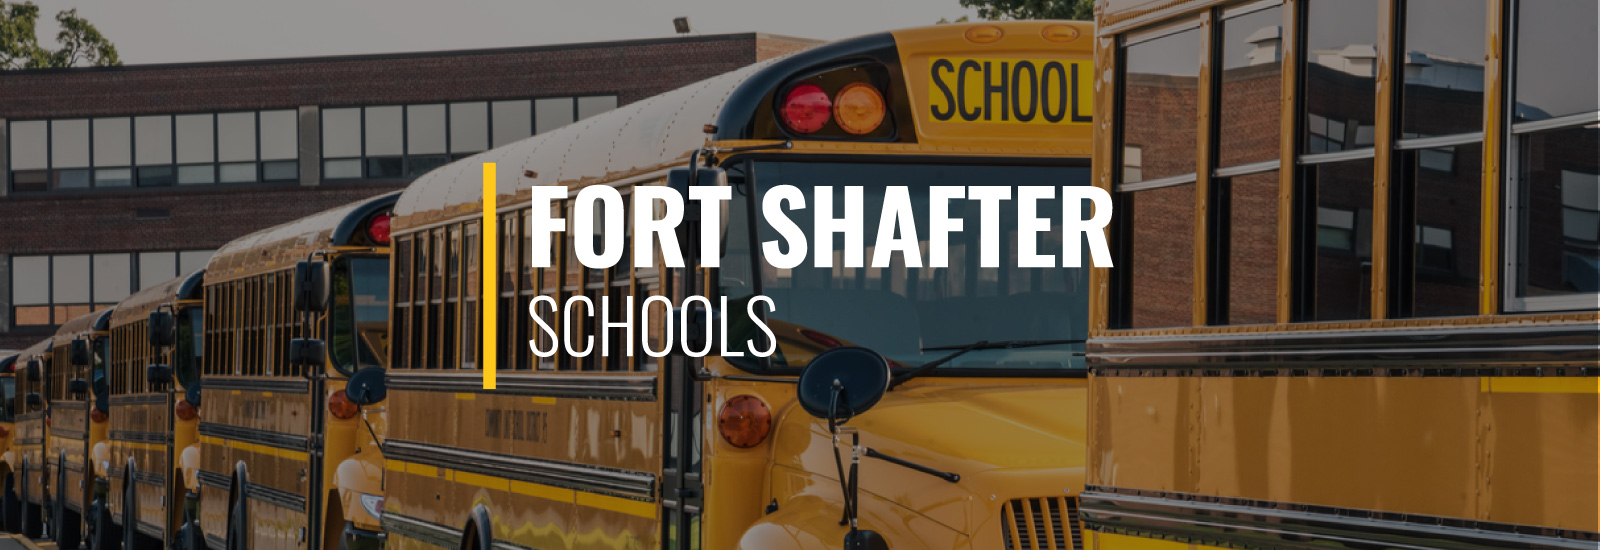 Fort Shafter Schools